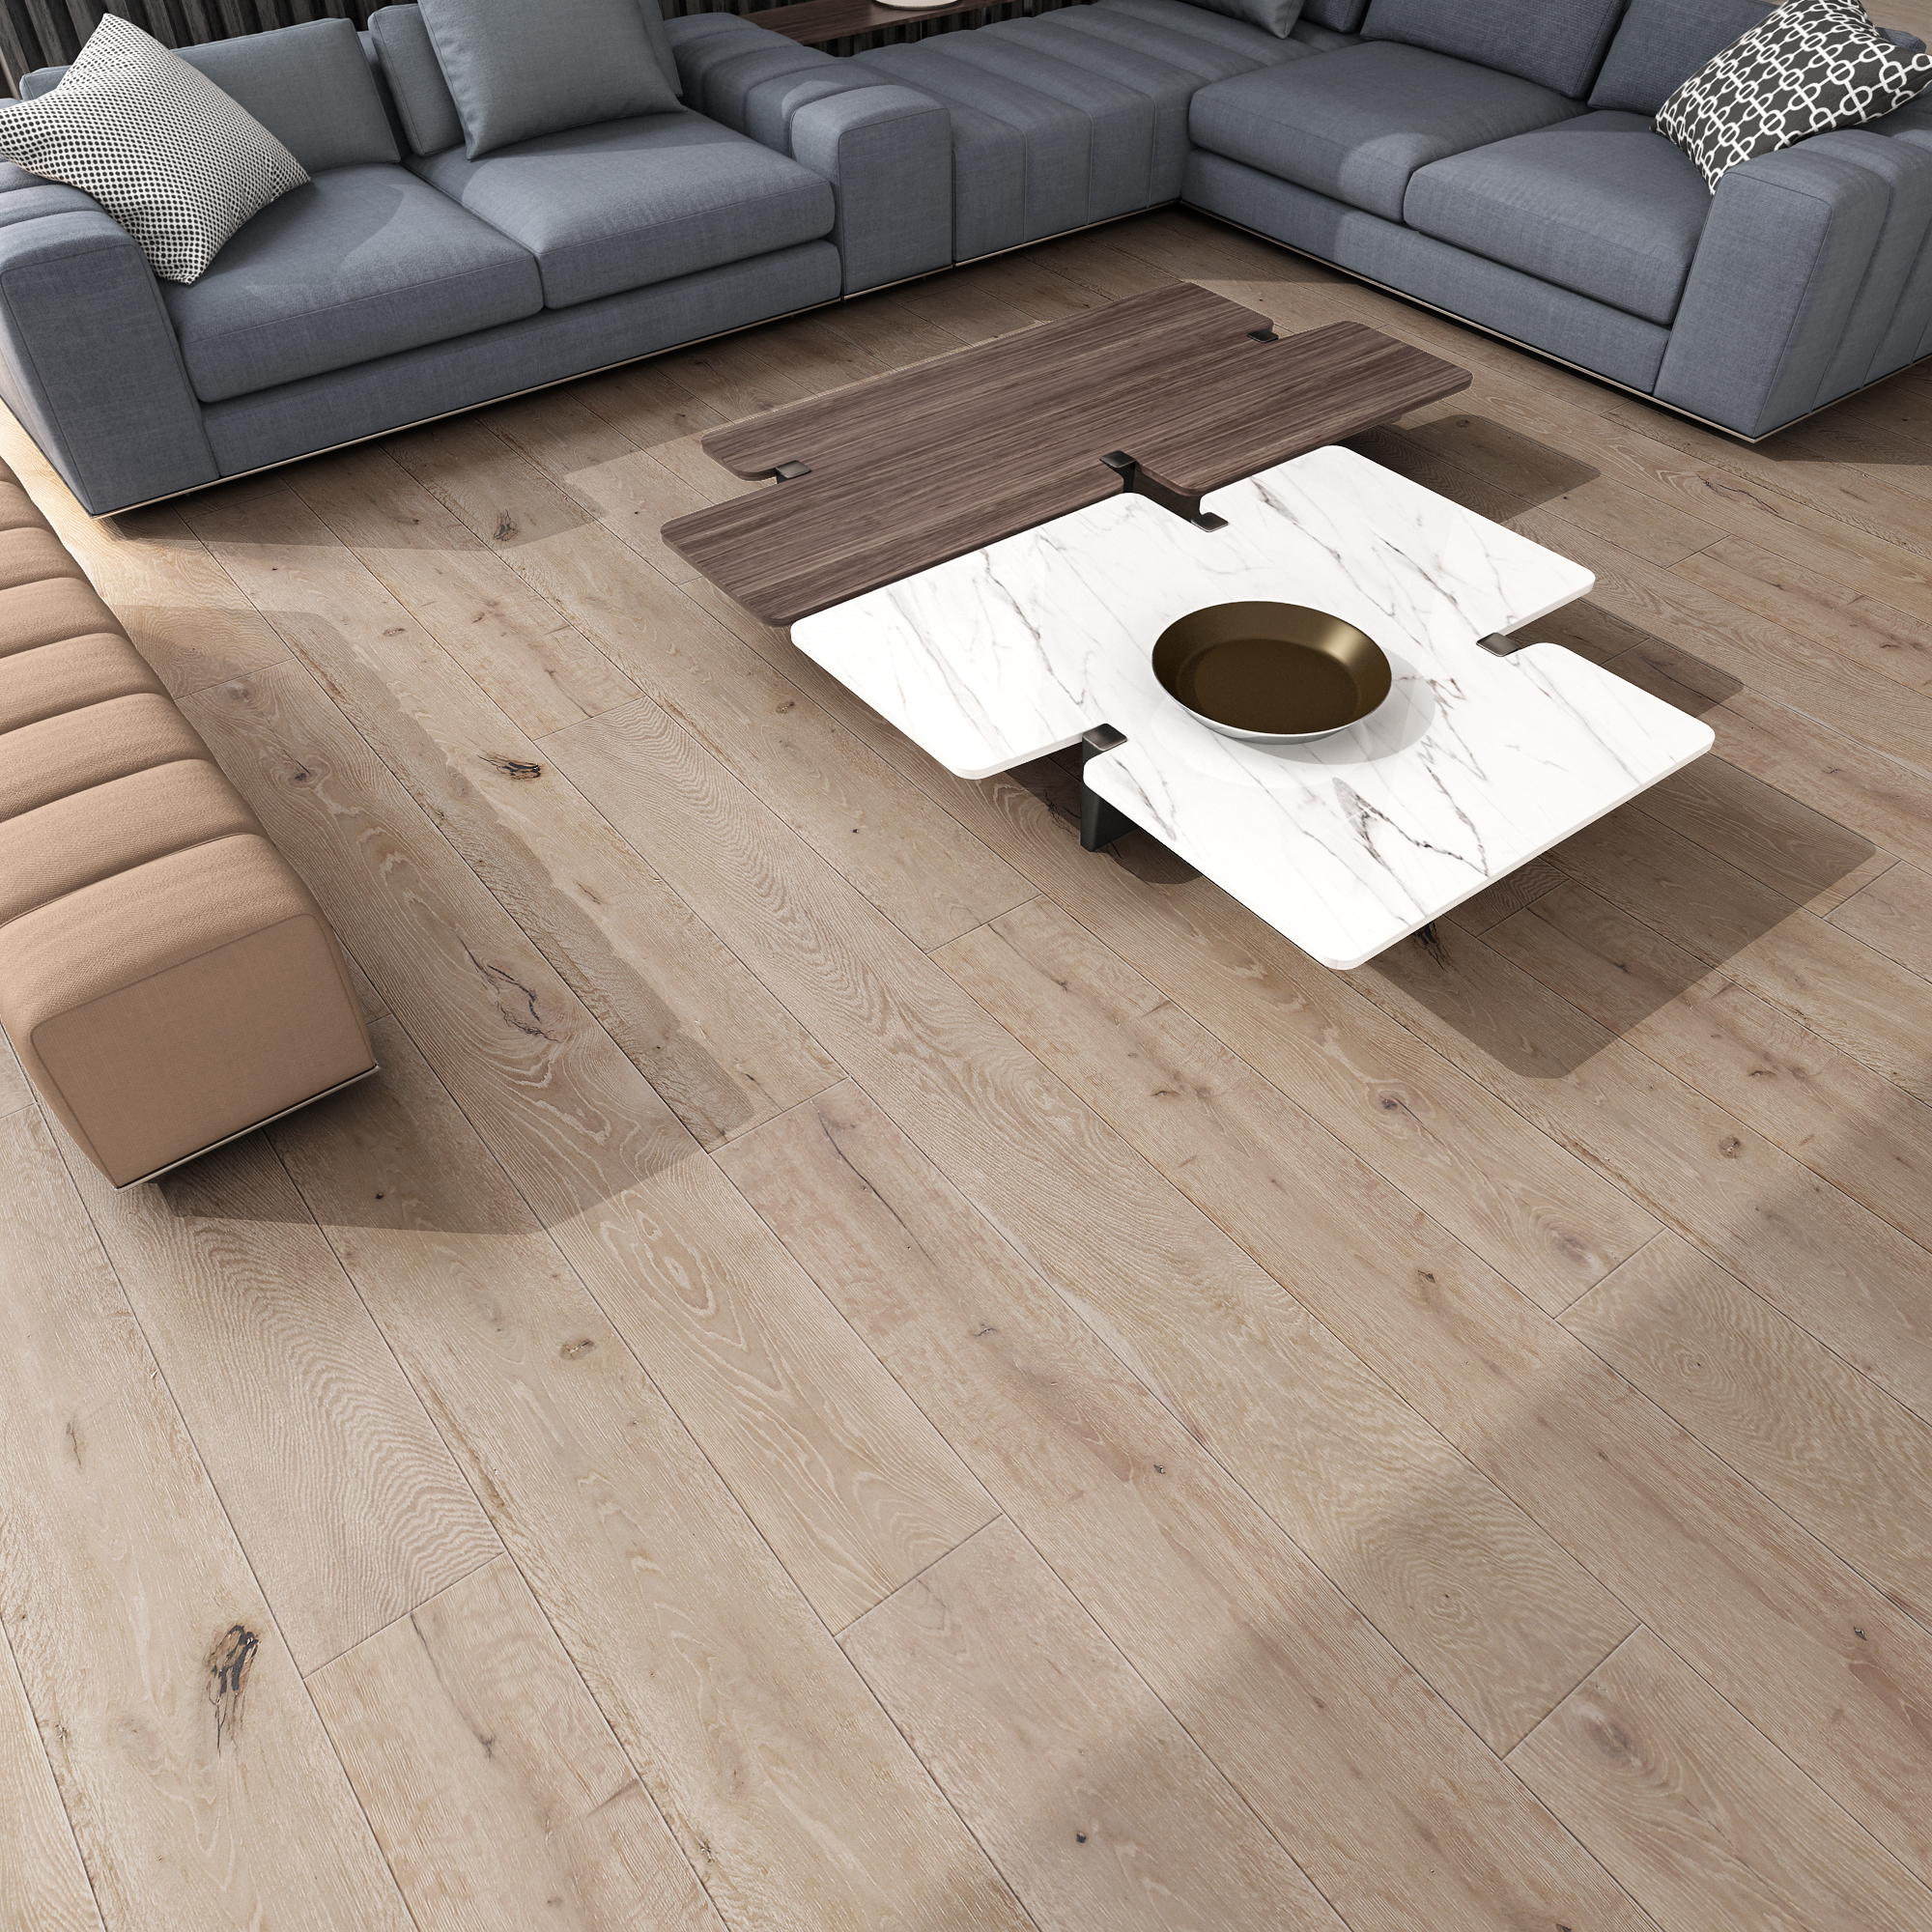 Lombardy_Living Room 3.jpg